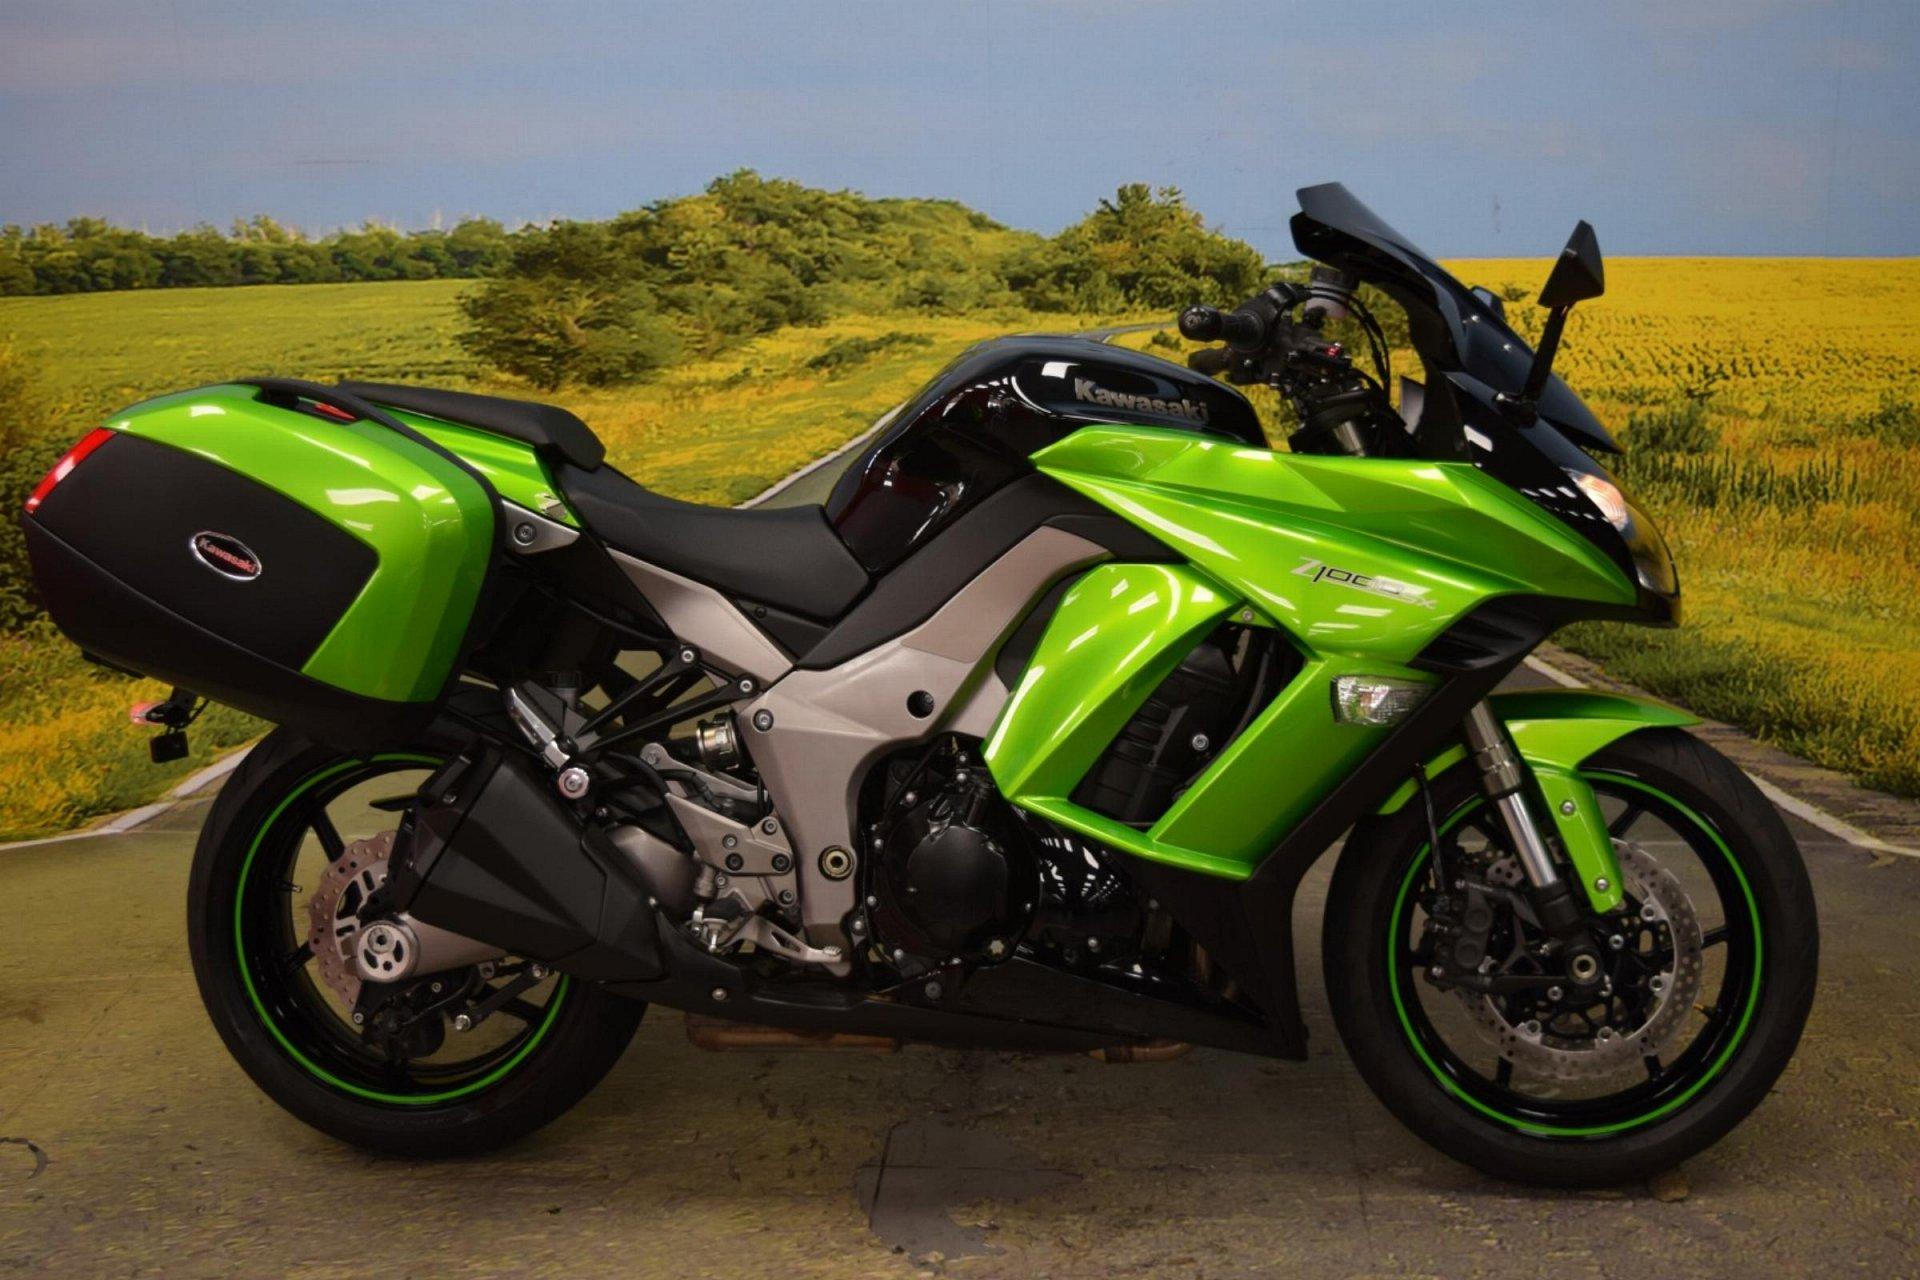 2014 Kawasaki Z1000 SX for sale in Staffordshire